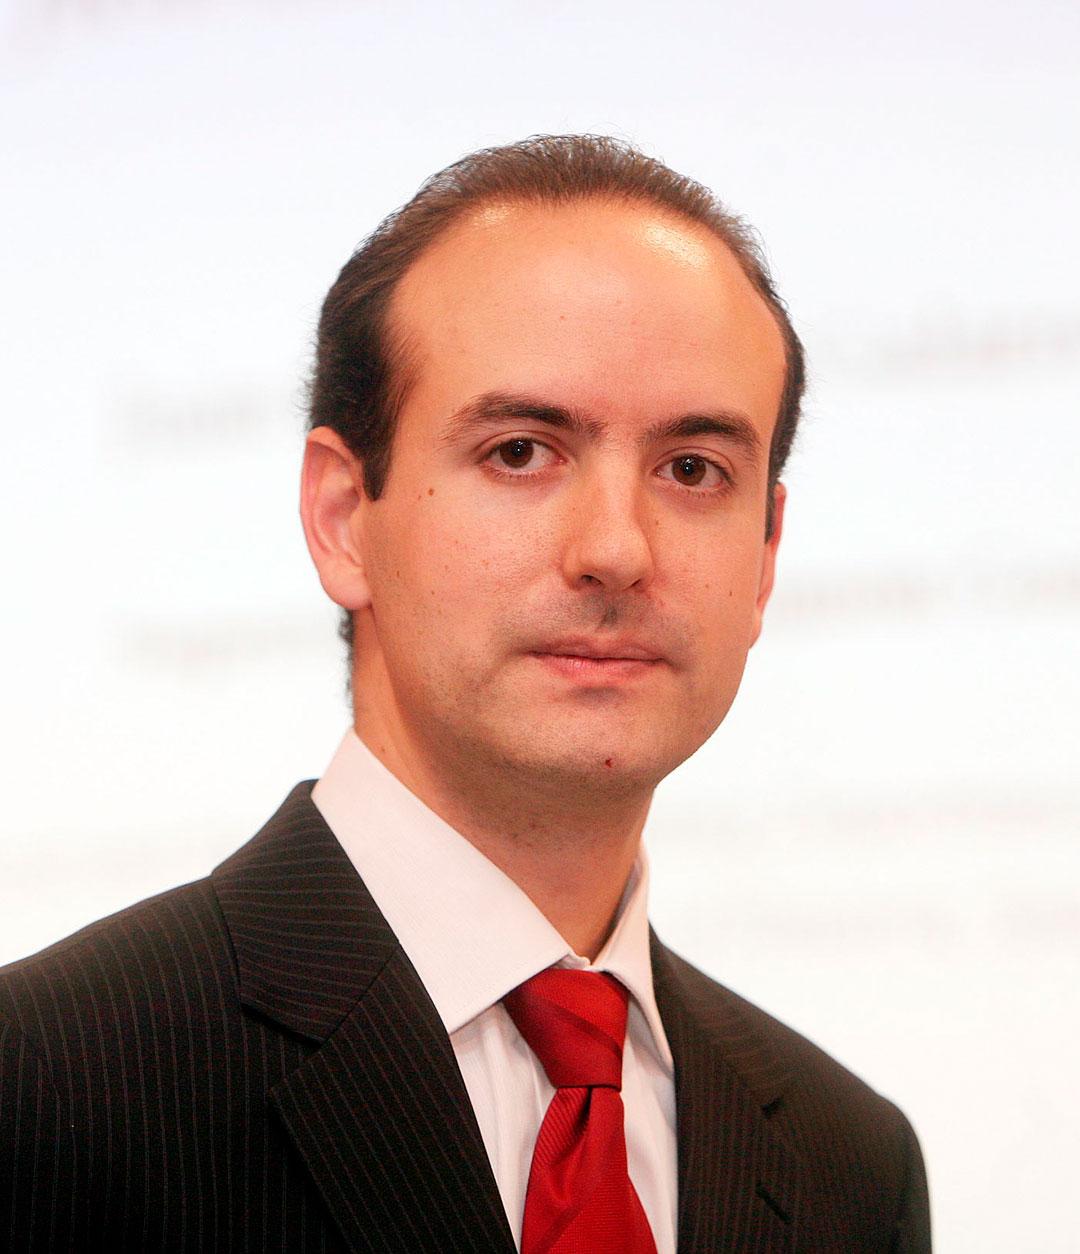 Juan Carlos Iriarte Galarregui